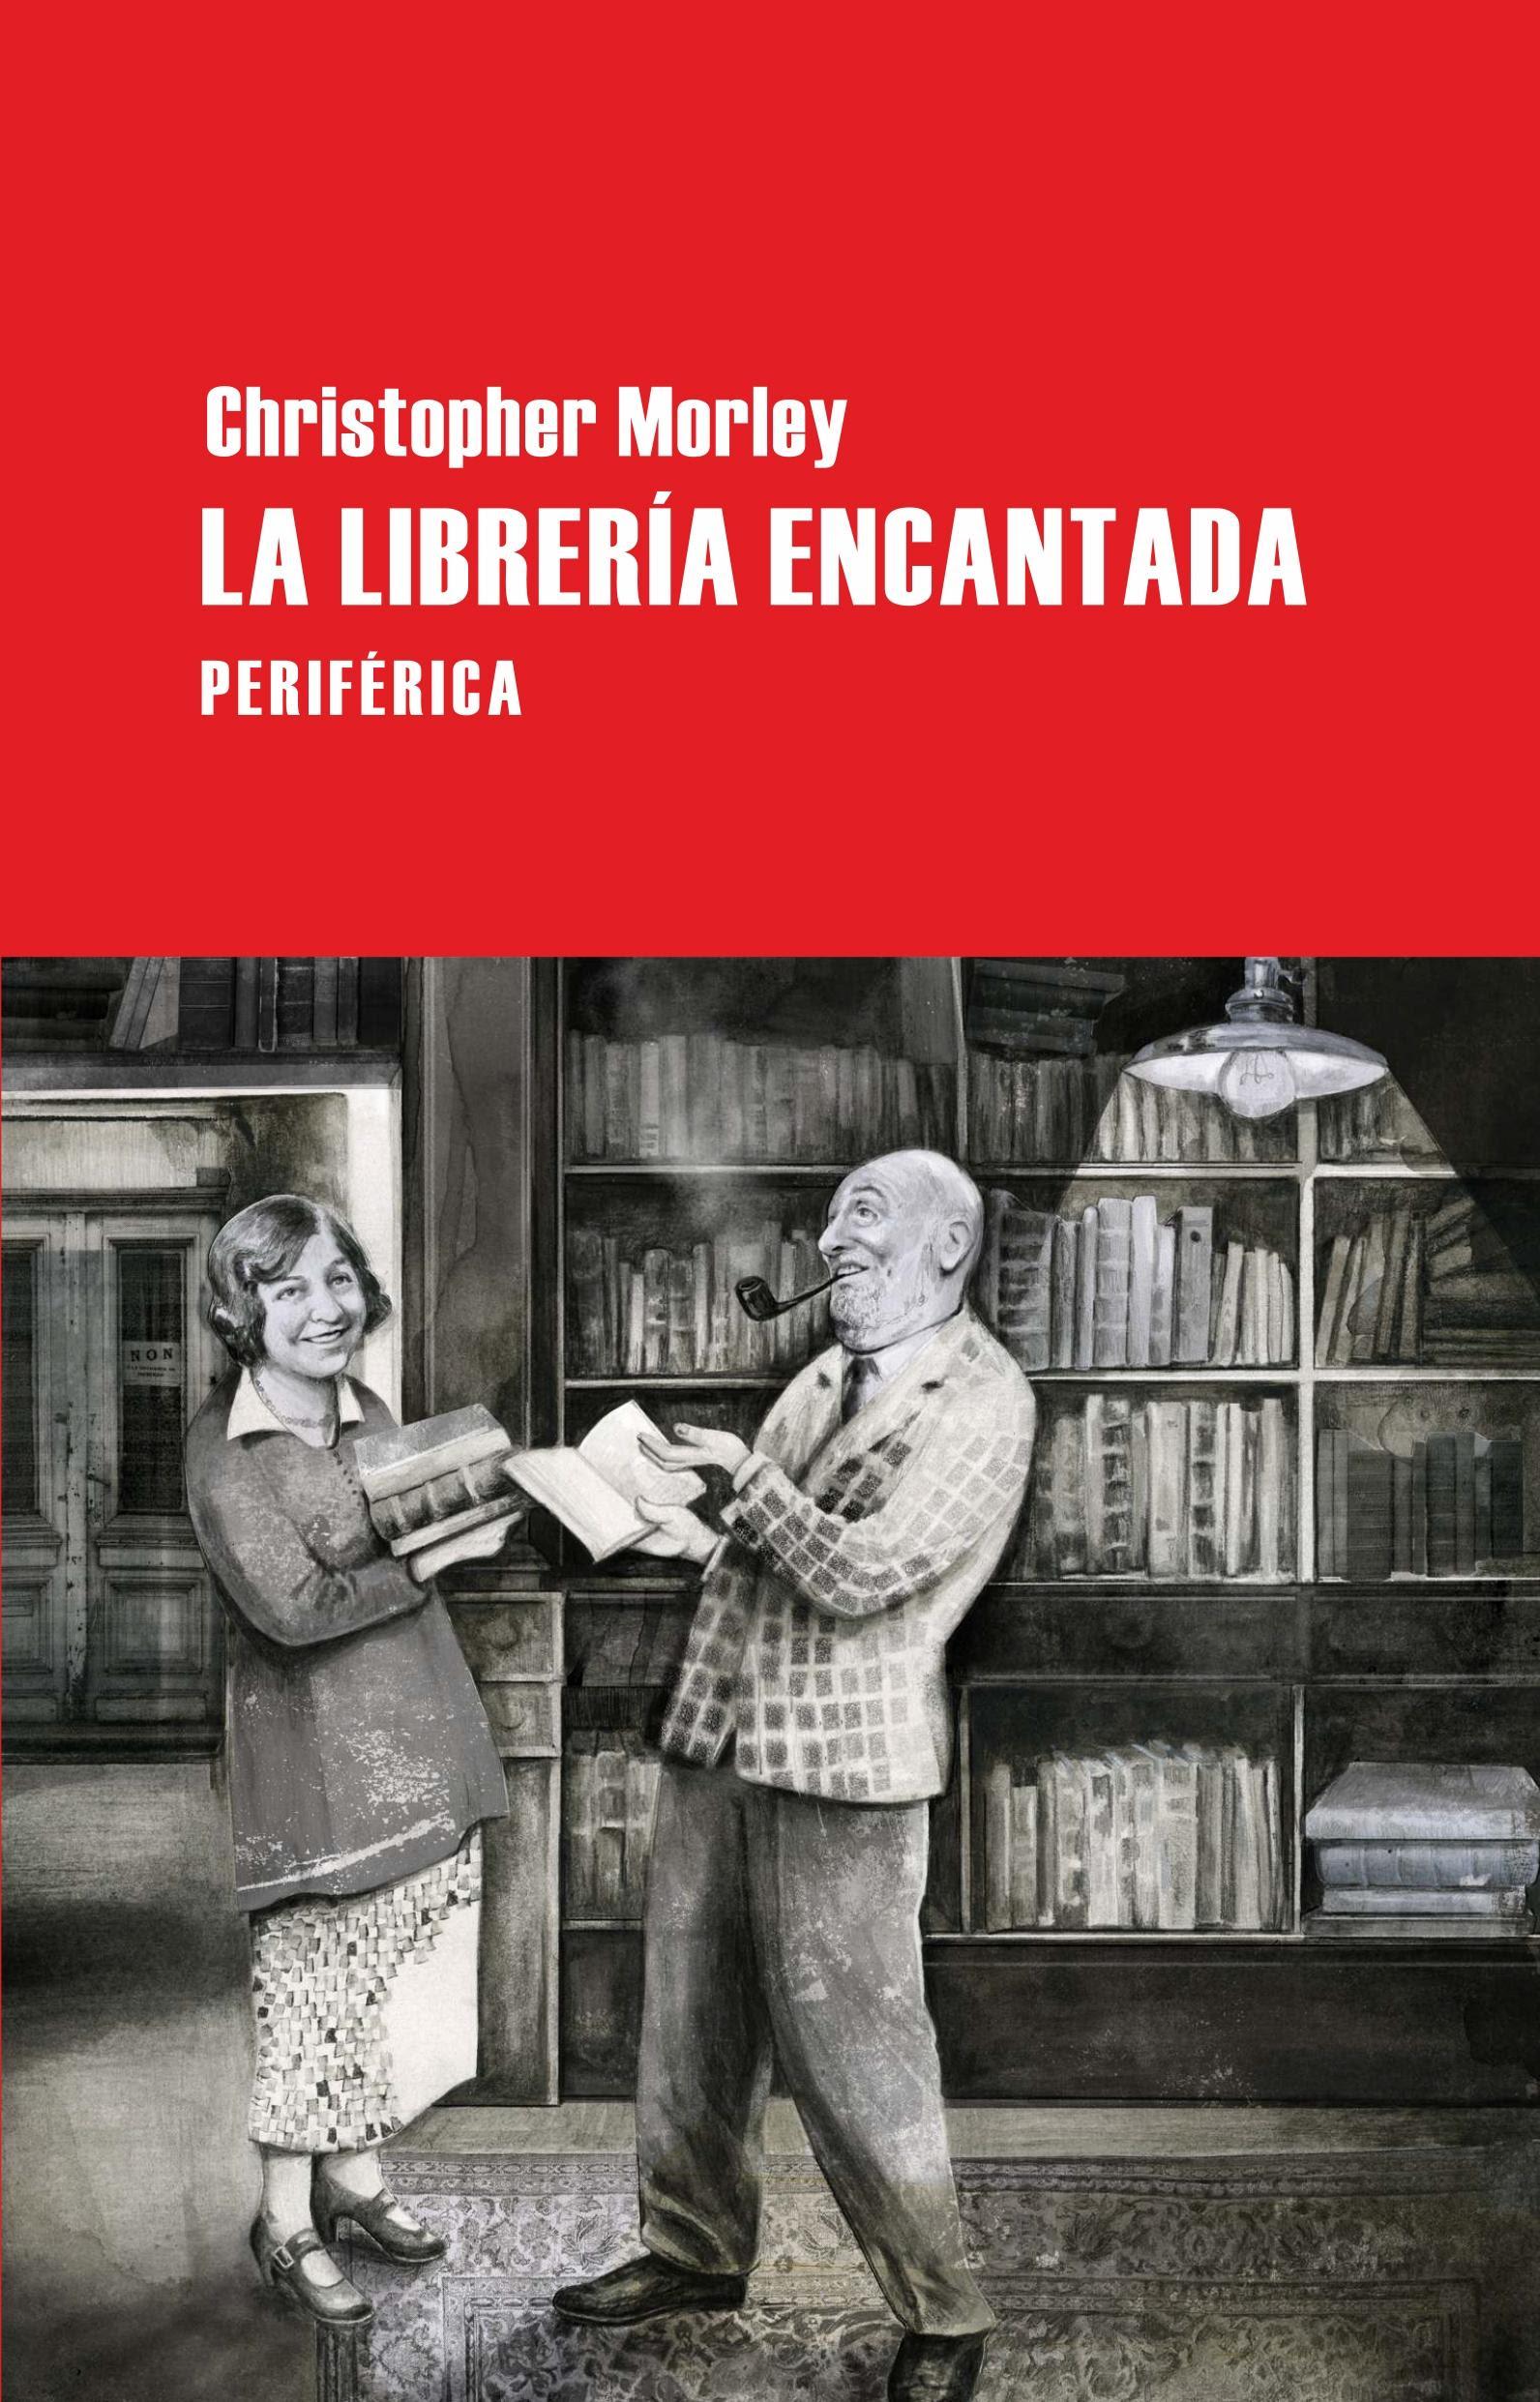 http://www.editorialperiferica.com/?s=catalogo&l=110